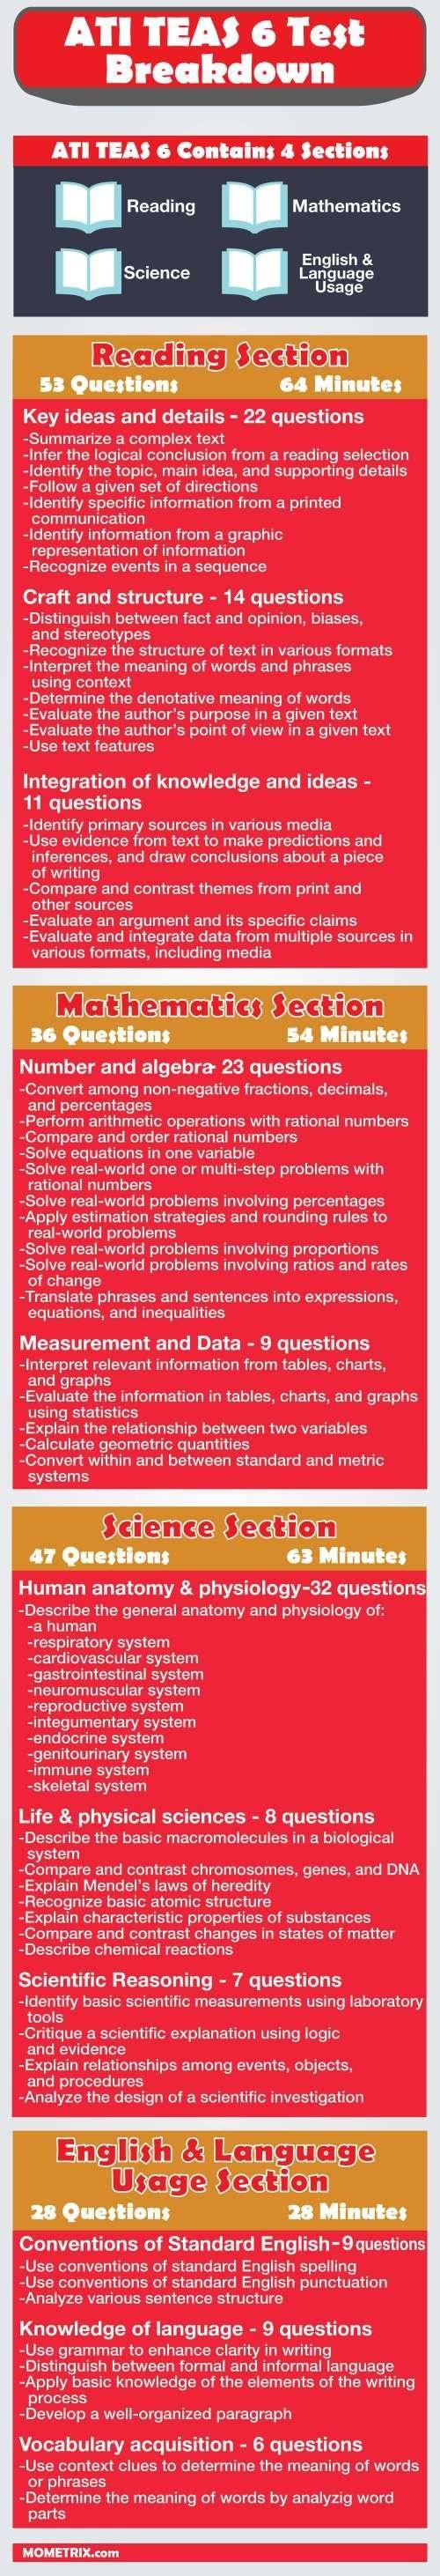 Ati Teas 6 Test Outline [Infographic] | Teas Test Study Guide | Ati - Free Printable Teas Study Guide